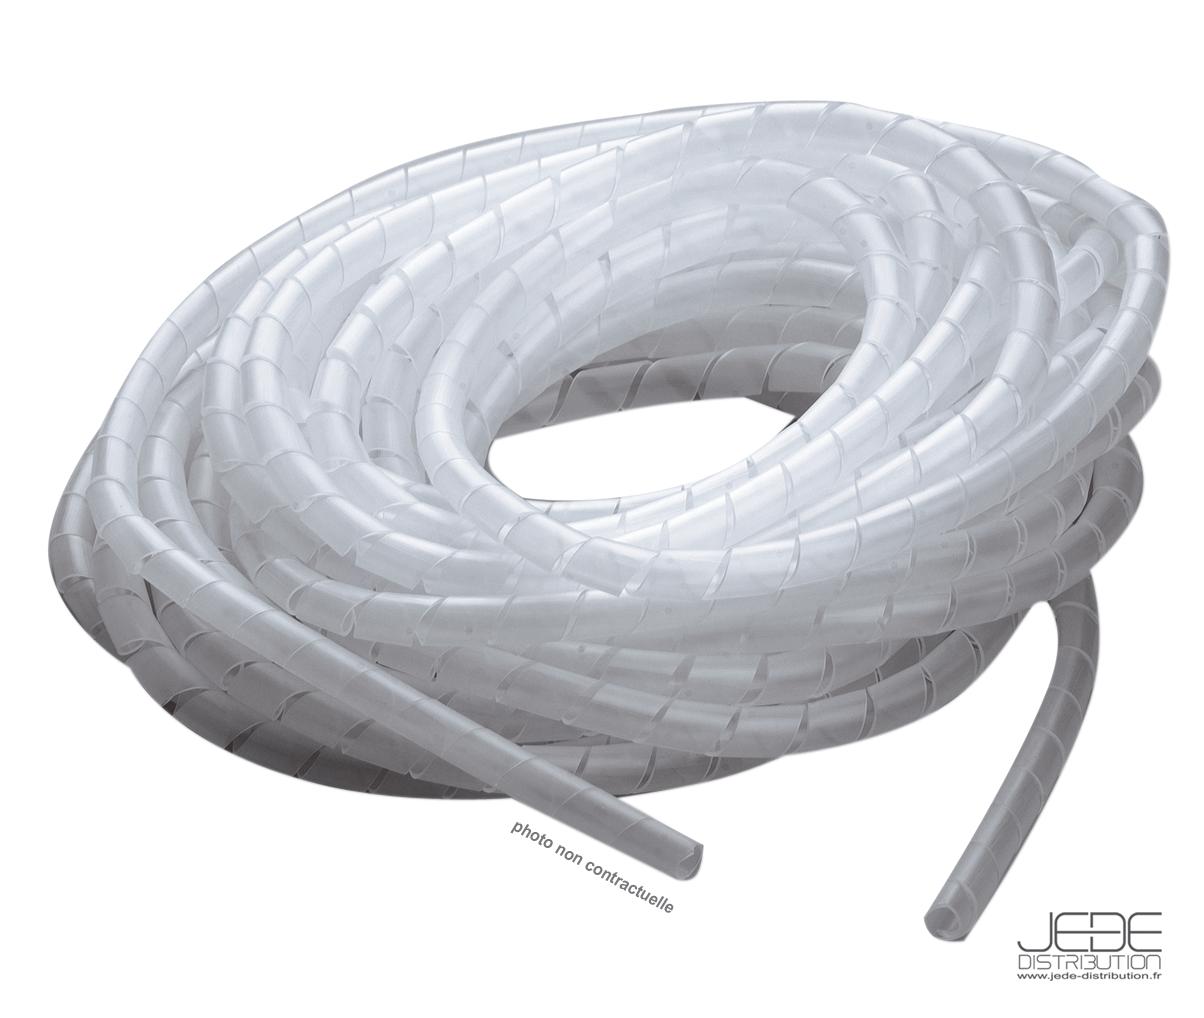 gaine spiral e transparente 15 mm 10 m jede. Black Bedroom Furniture Sets. Home Design Ideas